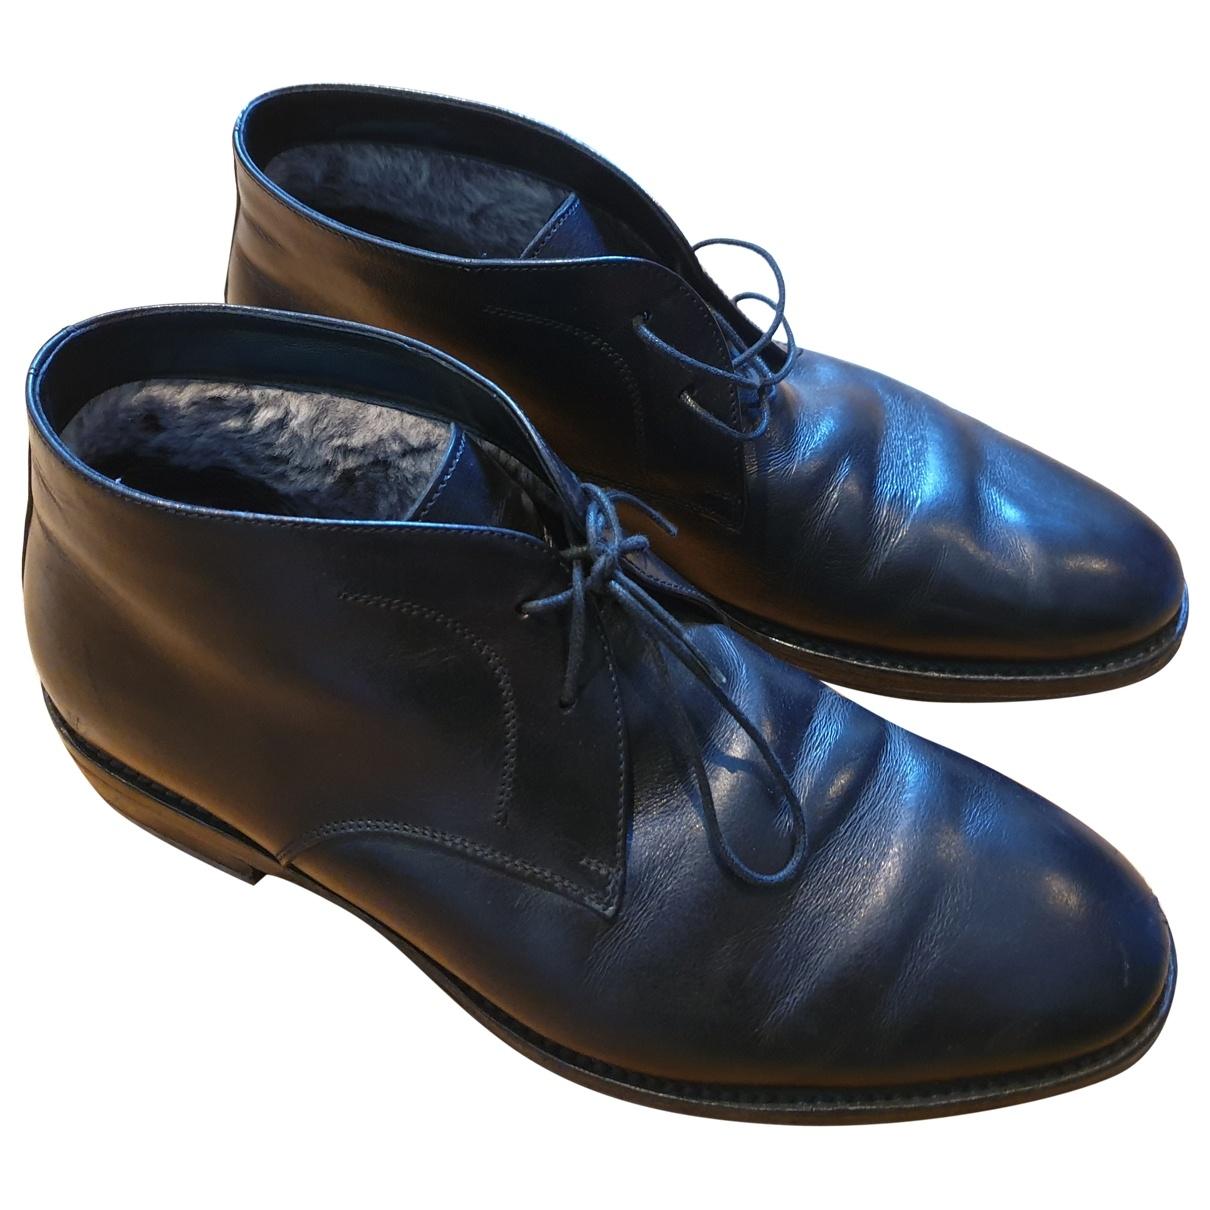 Salvatore Ferragamo \N Black Leather Boots for Men 41 EU